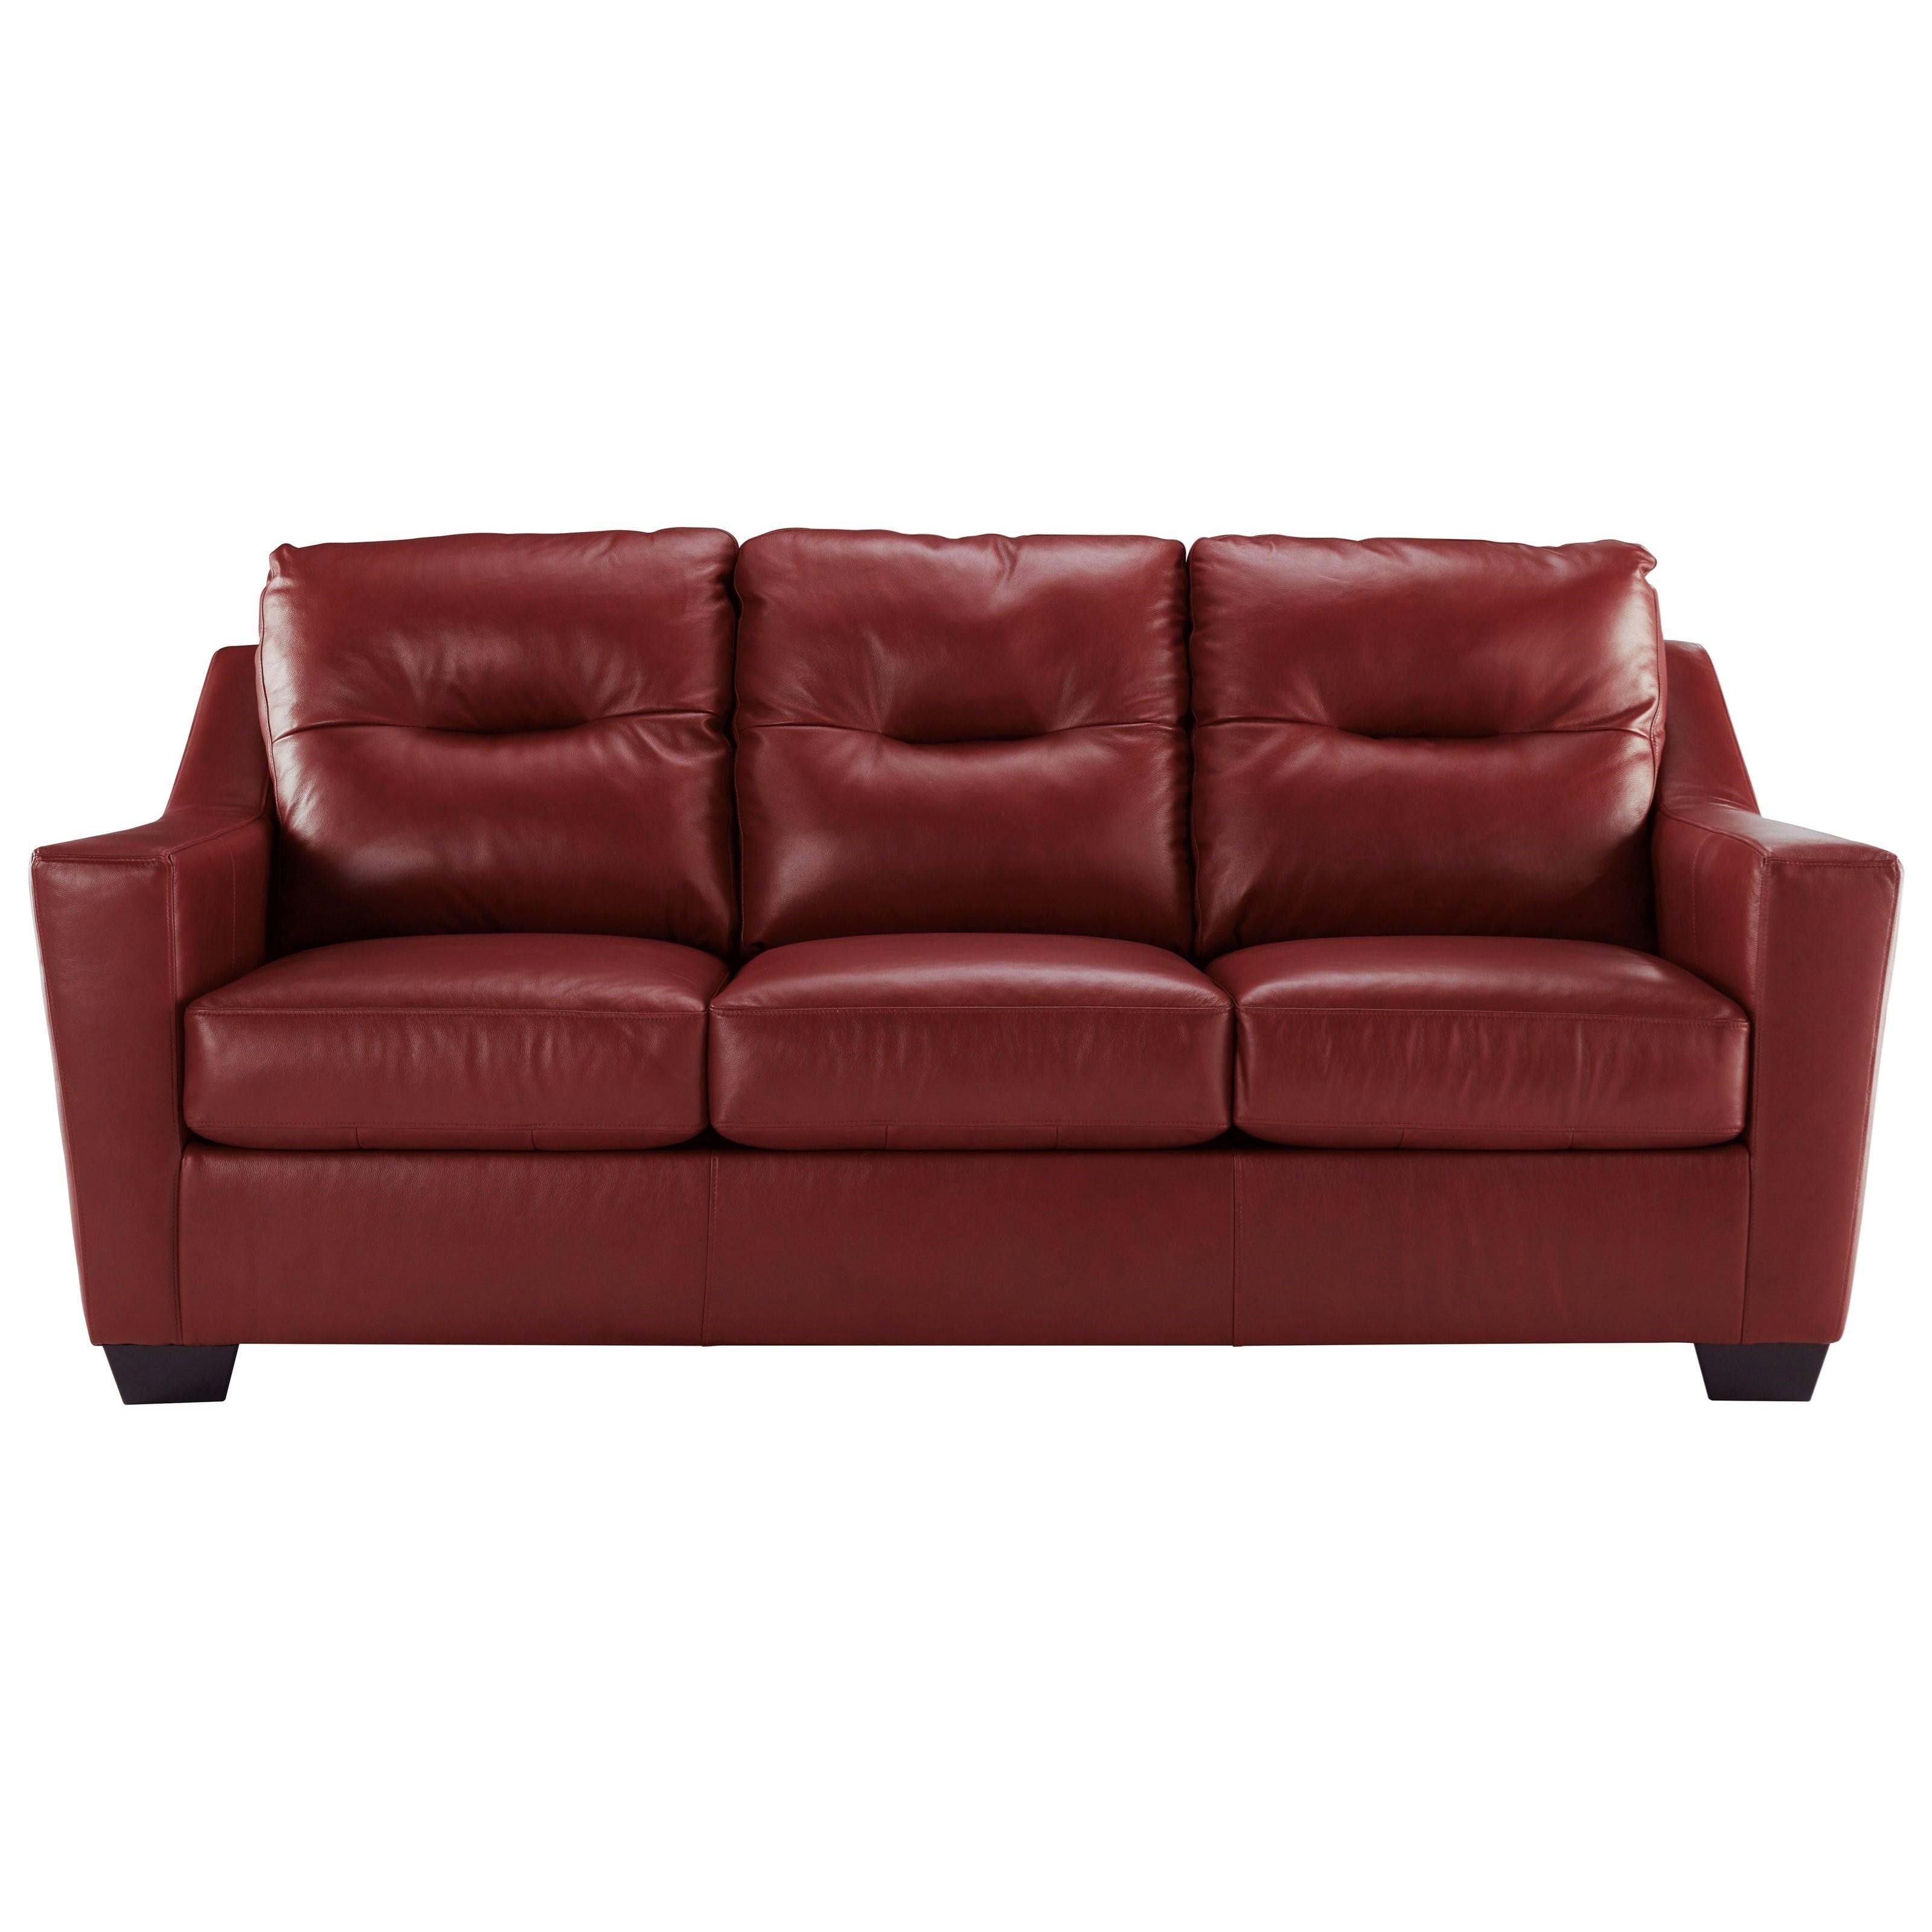 Signature Design by Ashley Kensbridge Queen Sofa Sleeper - Item Number: 6390739